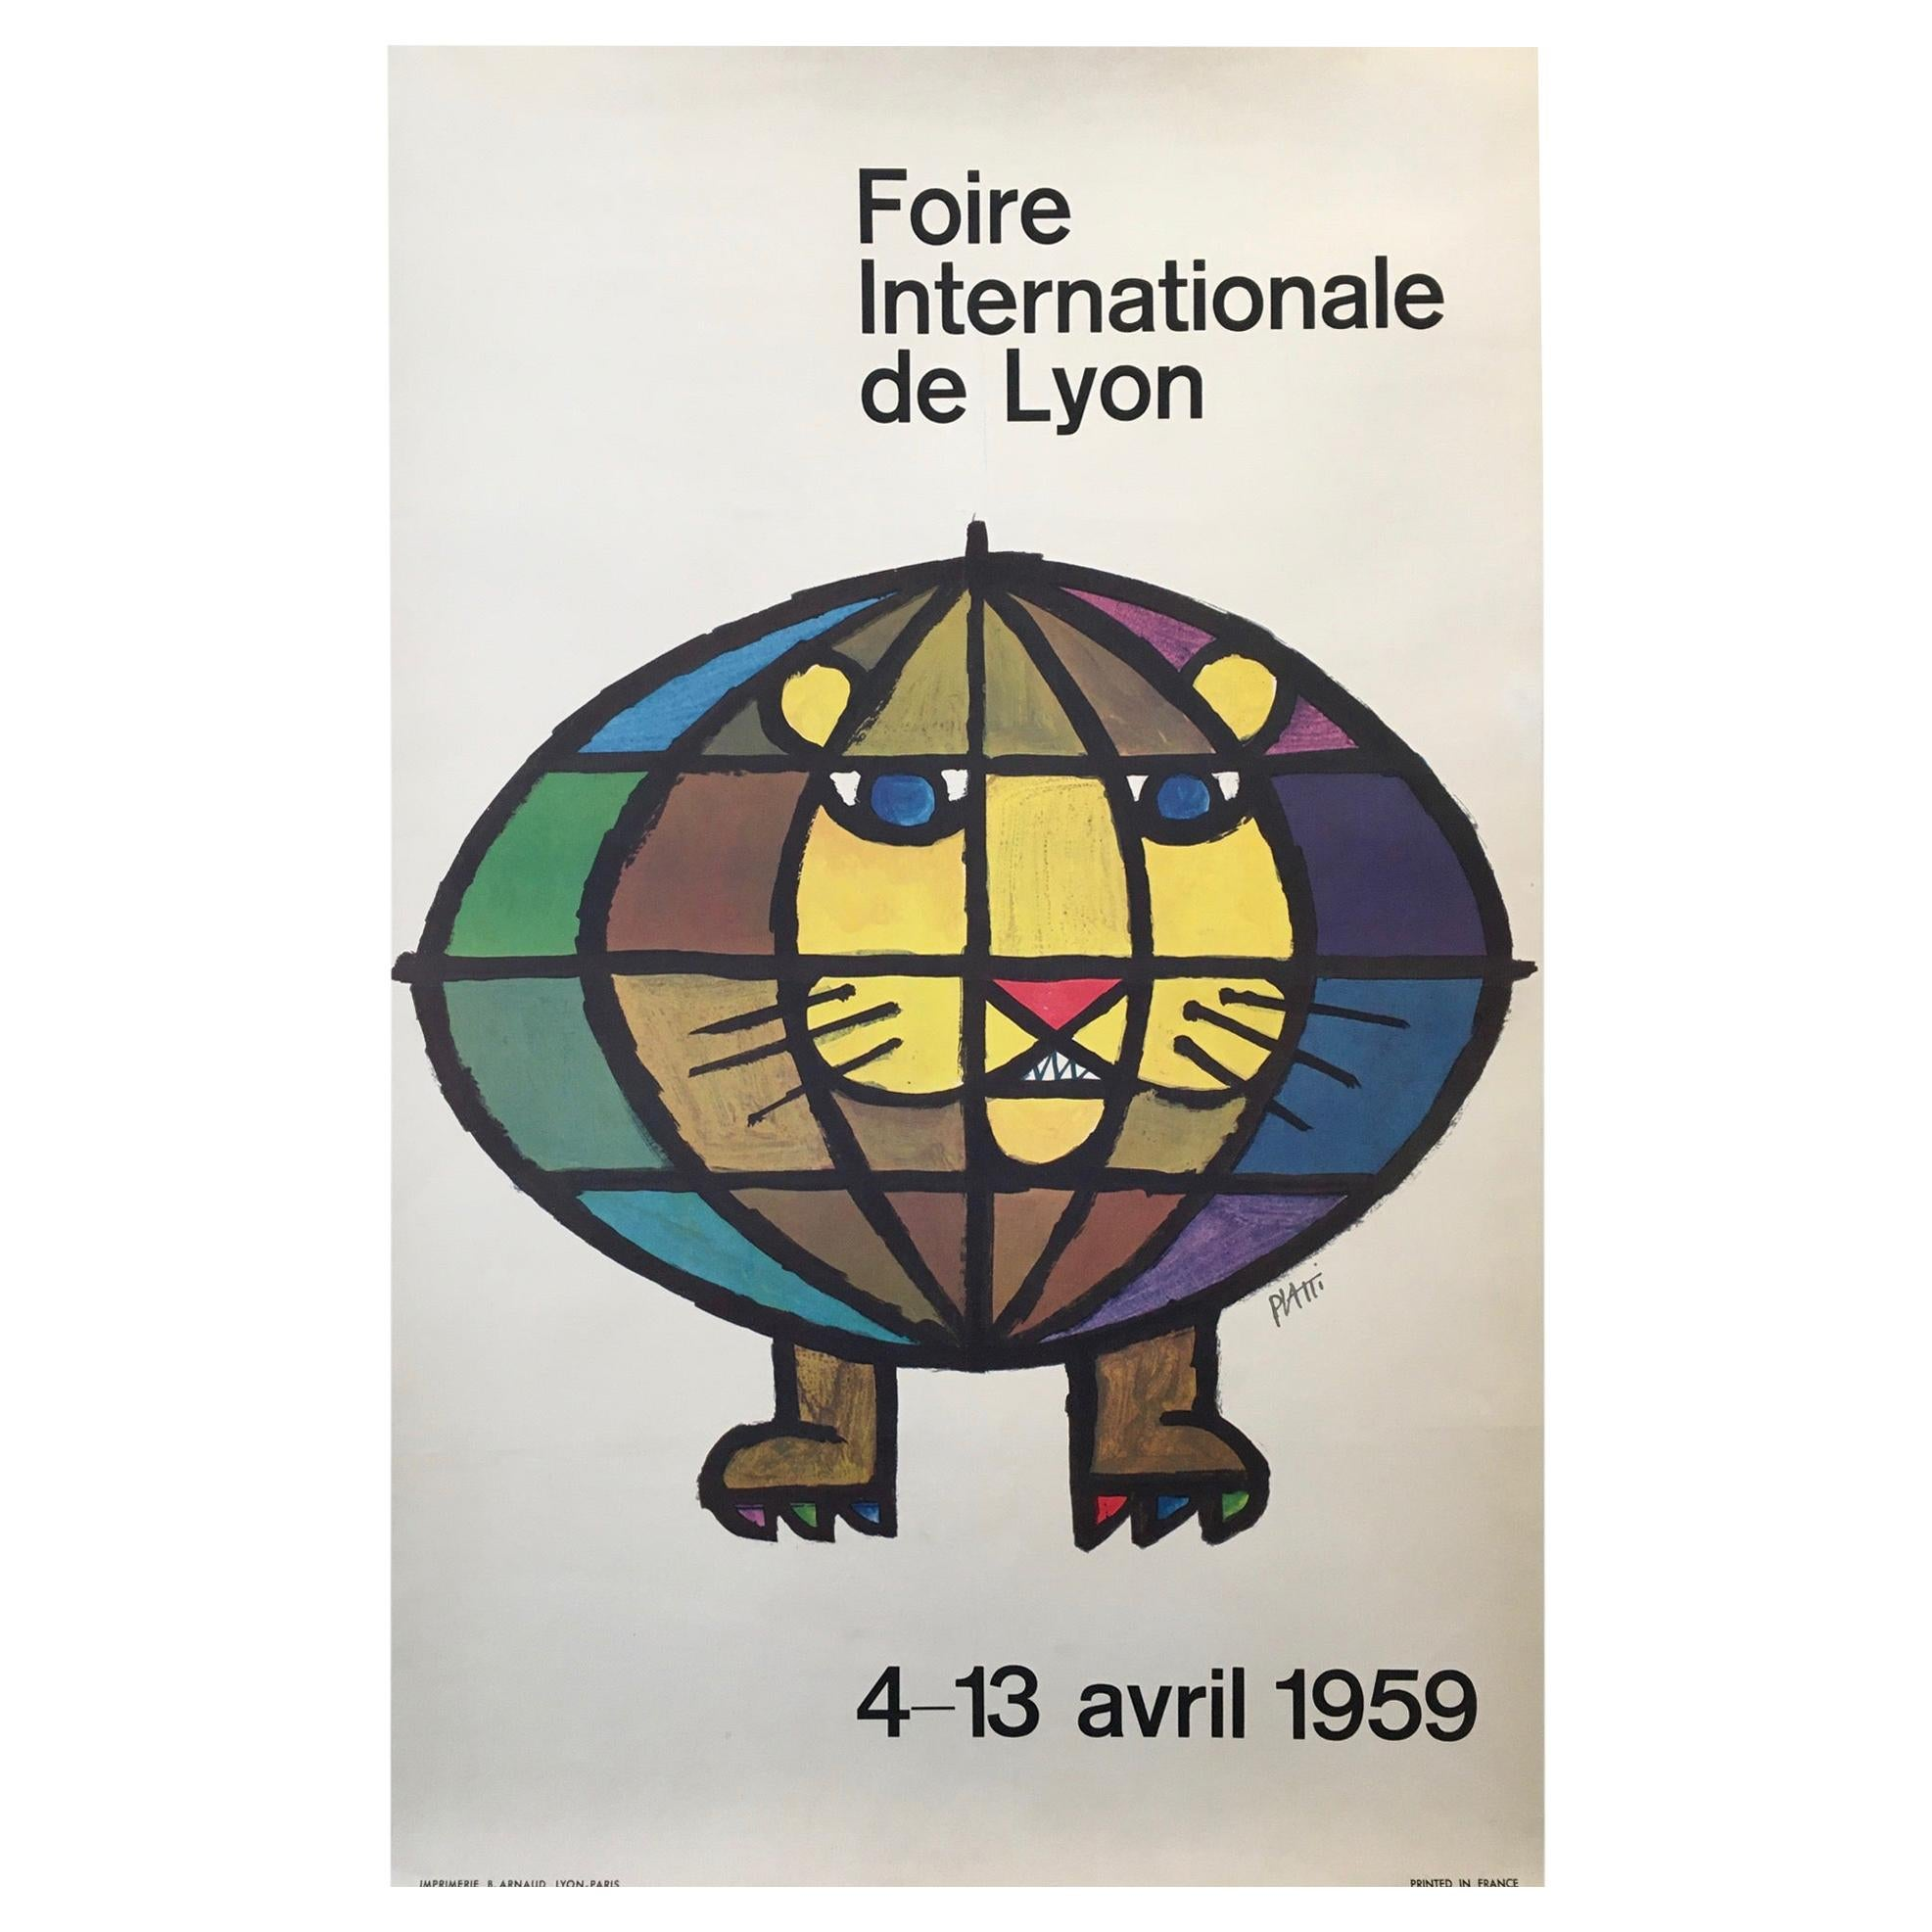 Original Vintage French Poster, 'Foire Internationale De Lyon' 1959 by Piatti